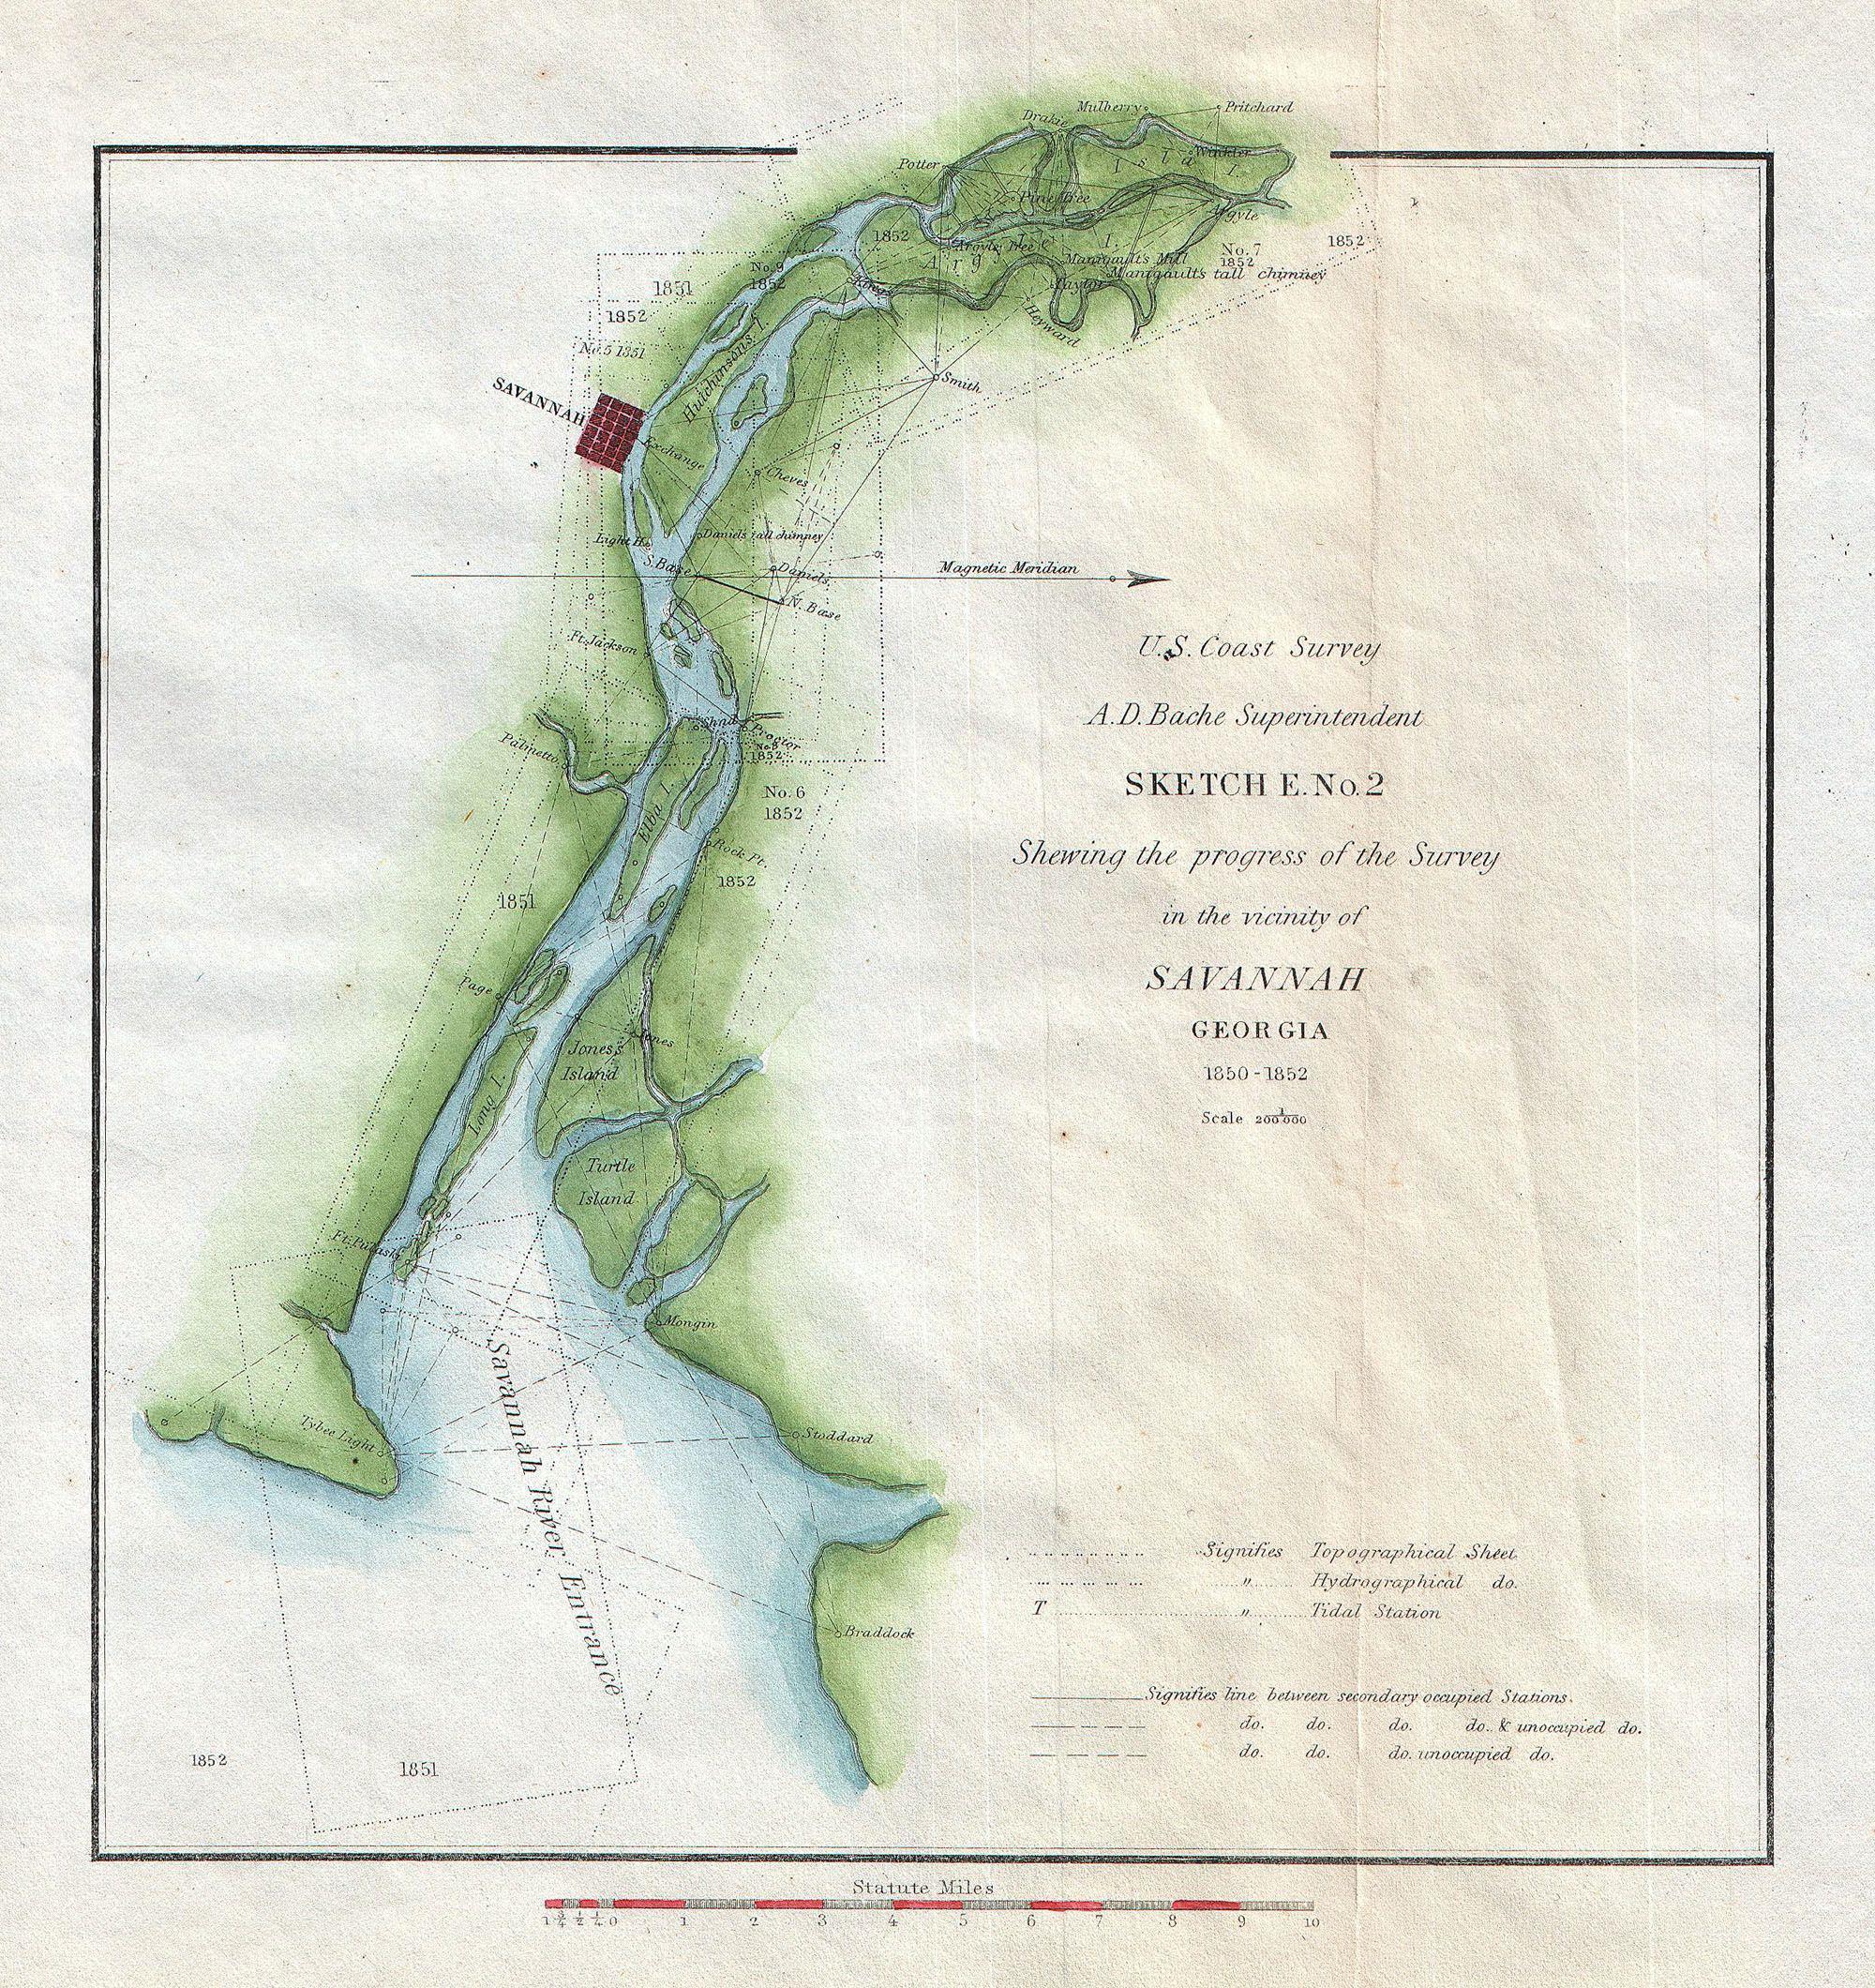 File US Coast Survey Map Of Savannah Georgia And The - Georgia map savannah river